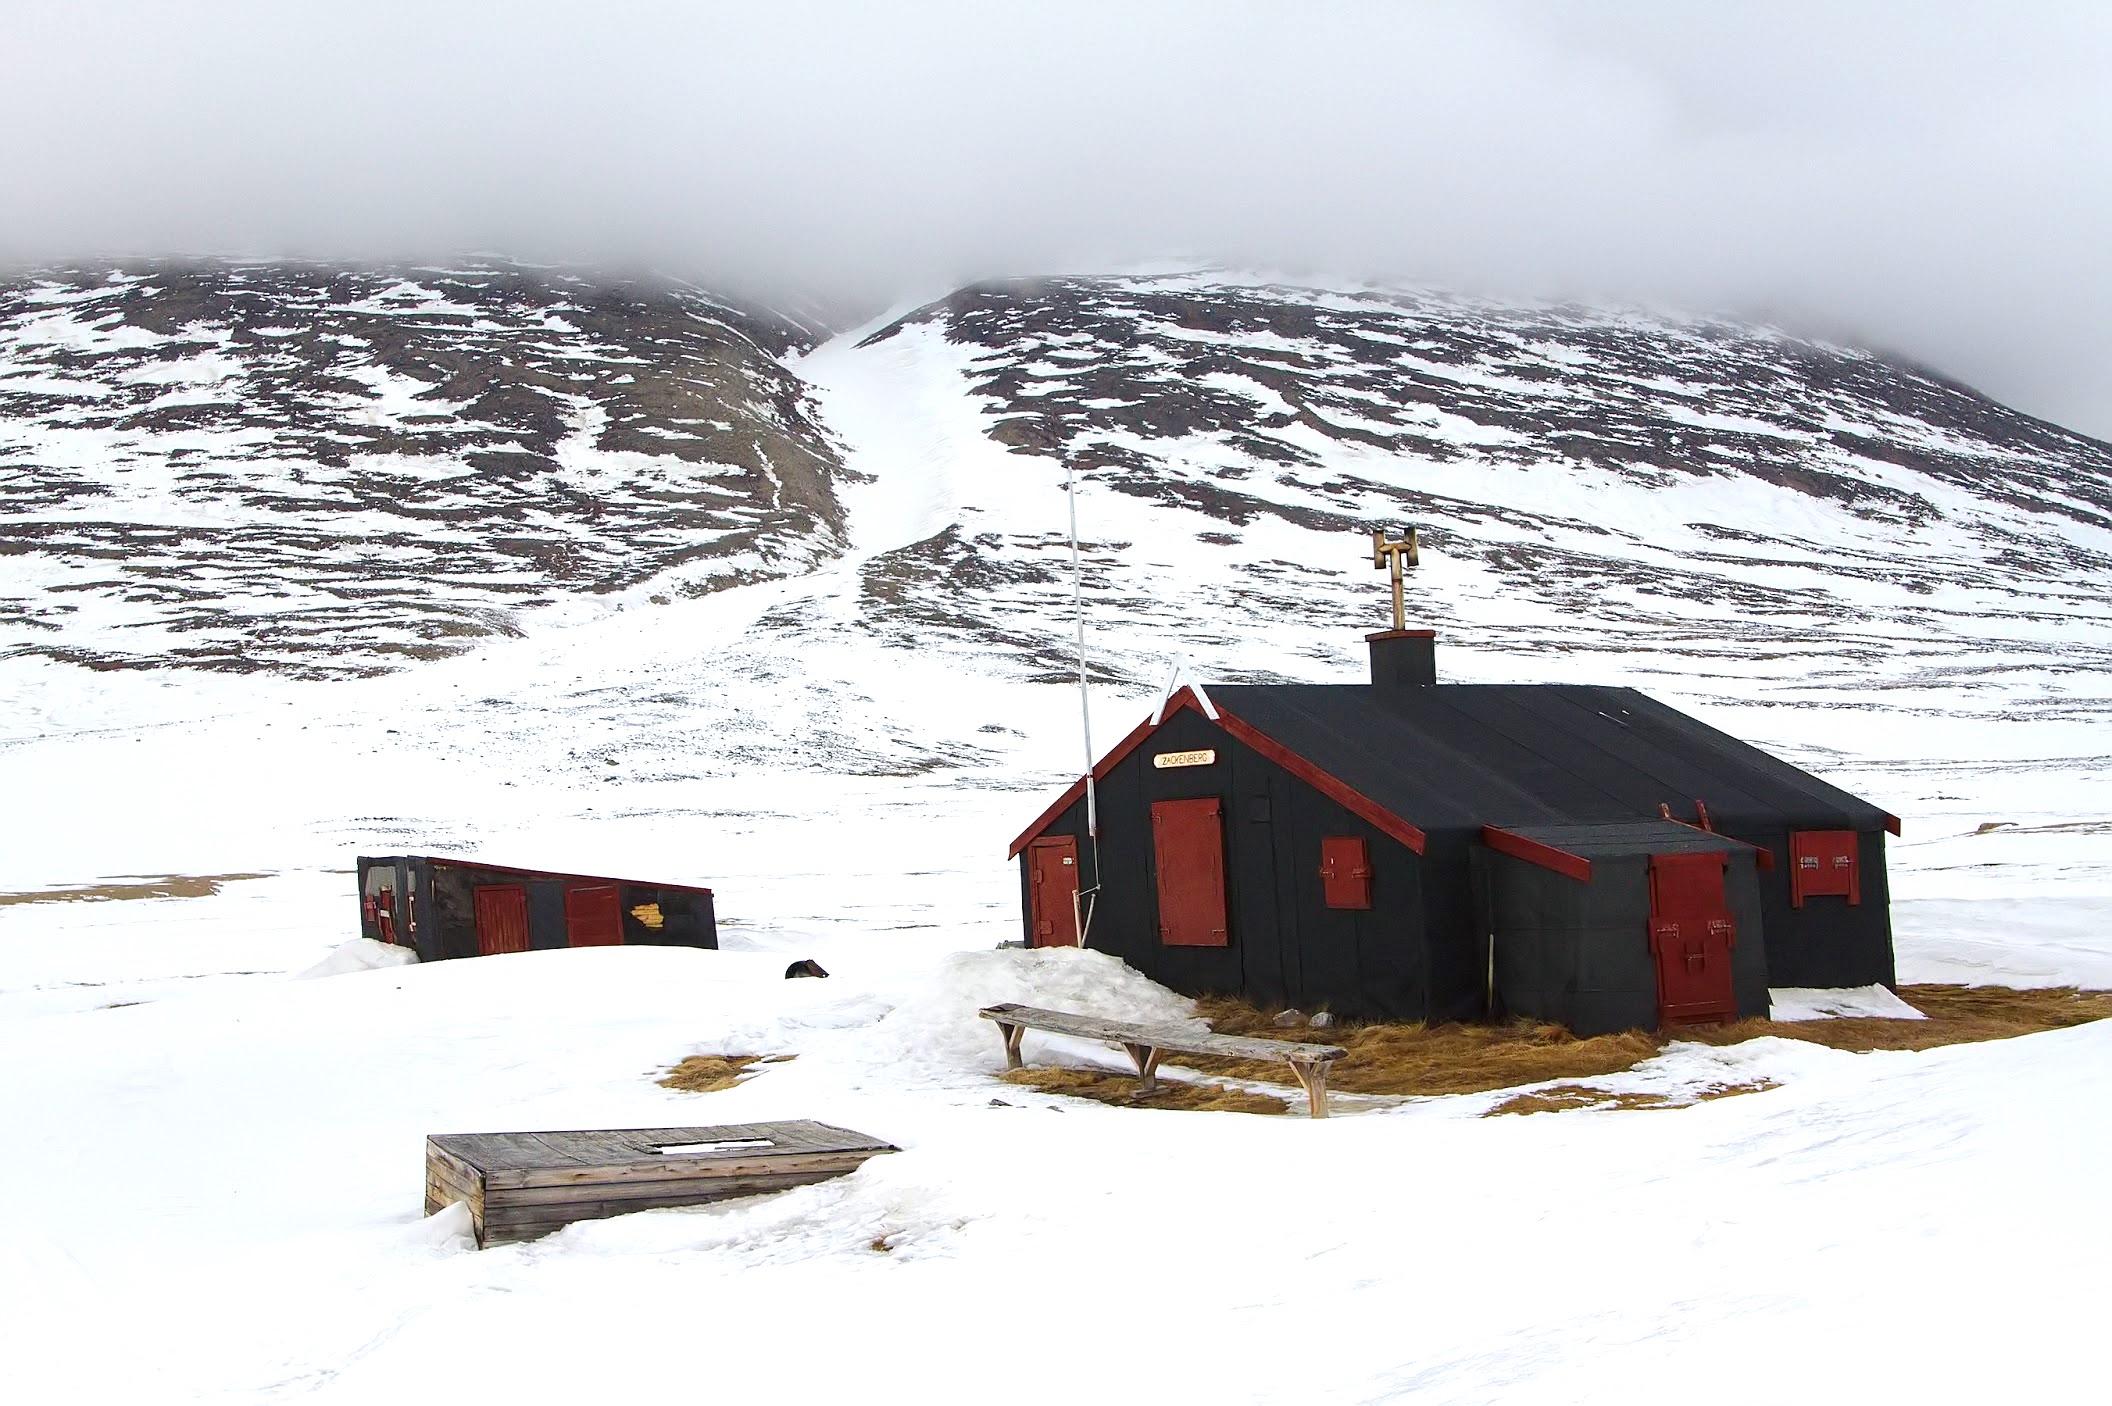 Observatorio de zonas polares: Horizonte 2050